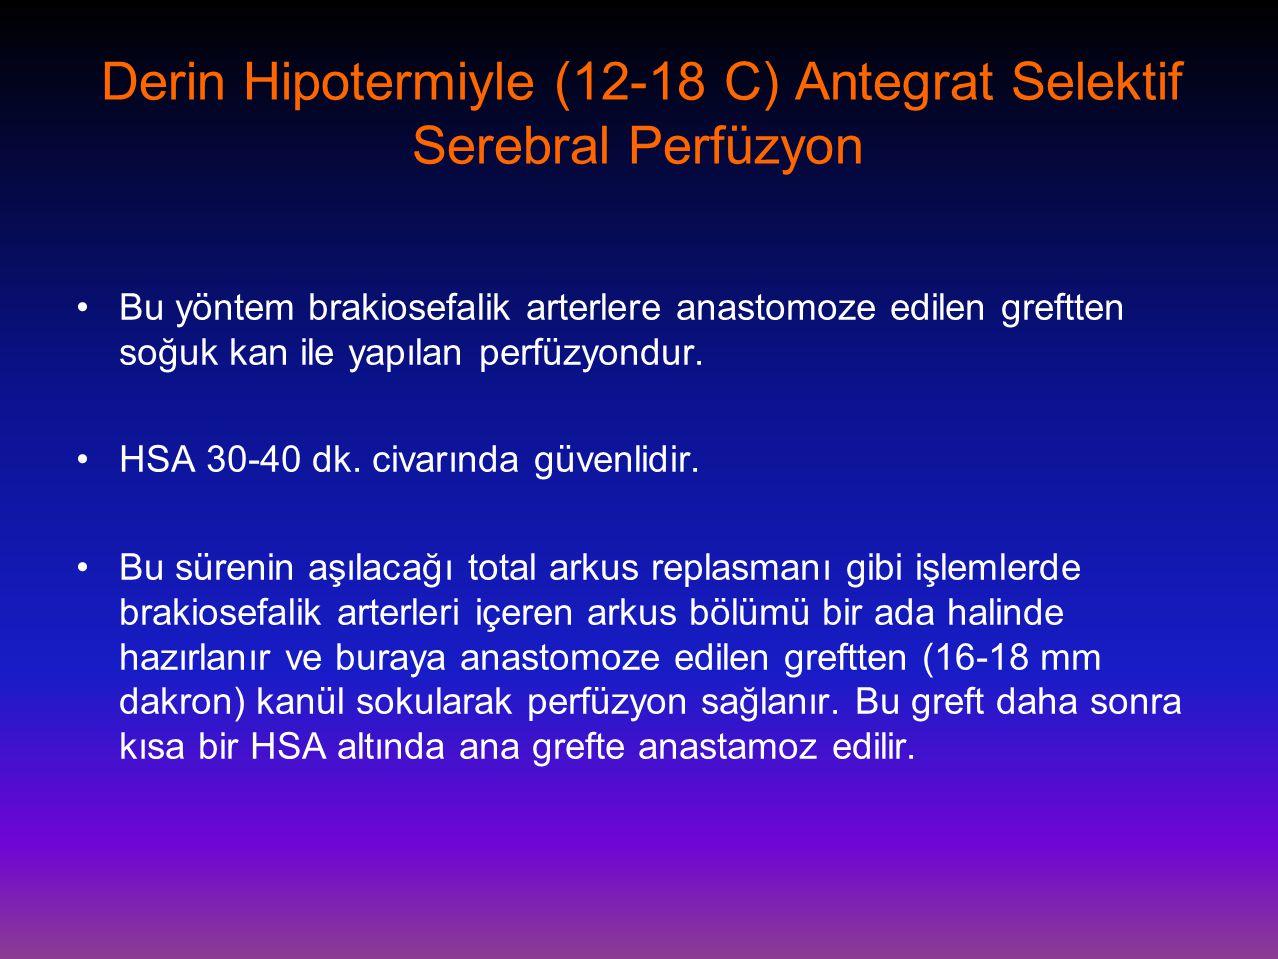 Derin Hipotermiyle (12-18 C) Antegrat Selektif Serebral Perfüzyon